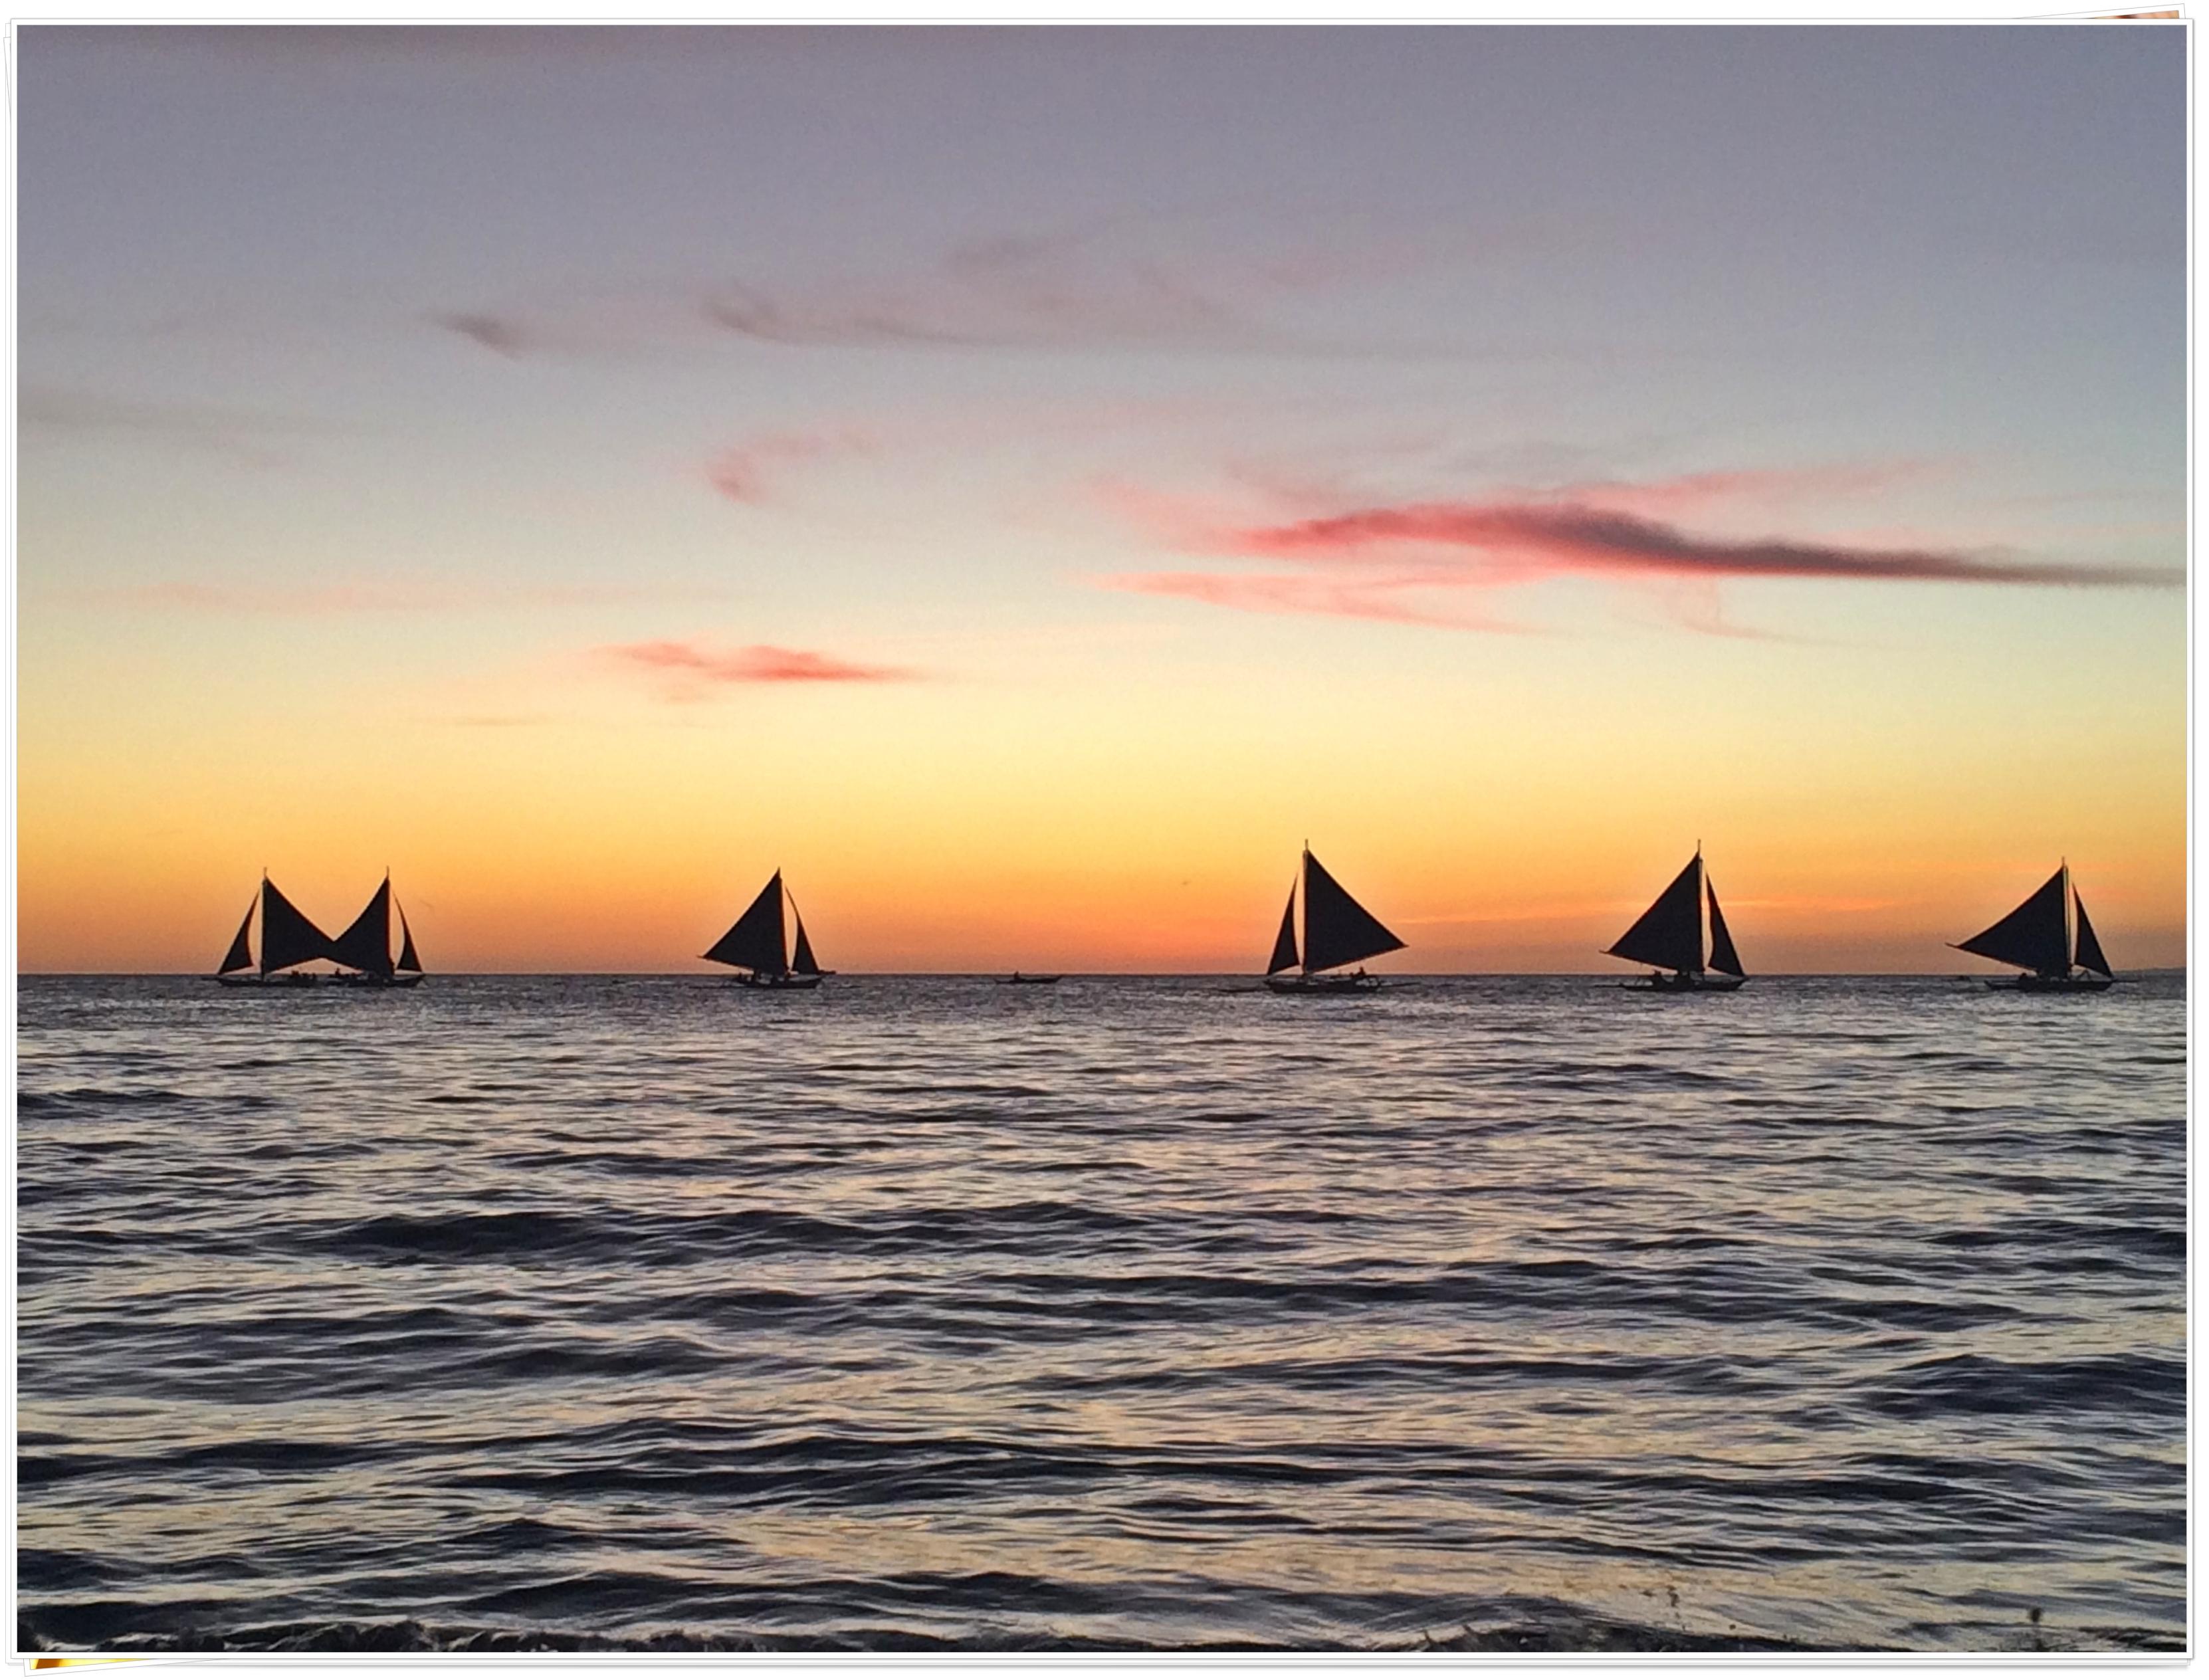 2015 Boracay Aklan Philippines (Boracay Sunset)